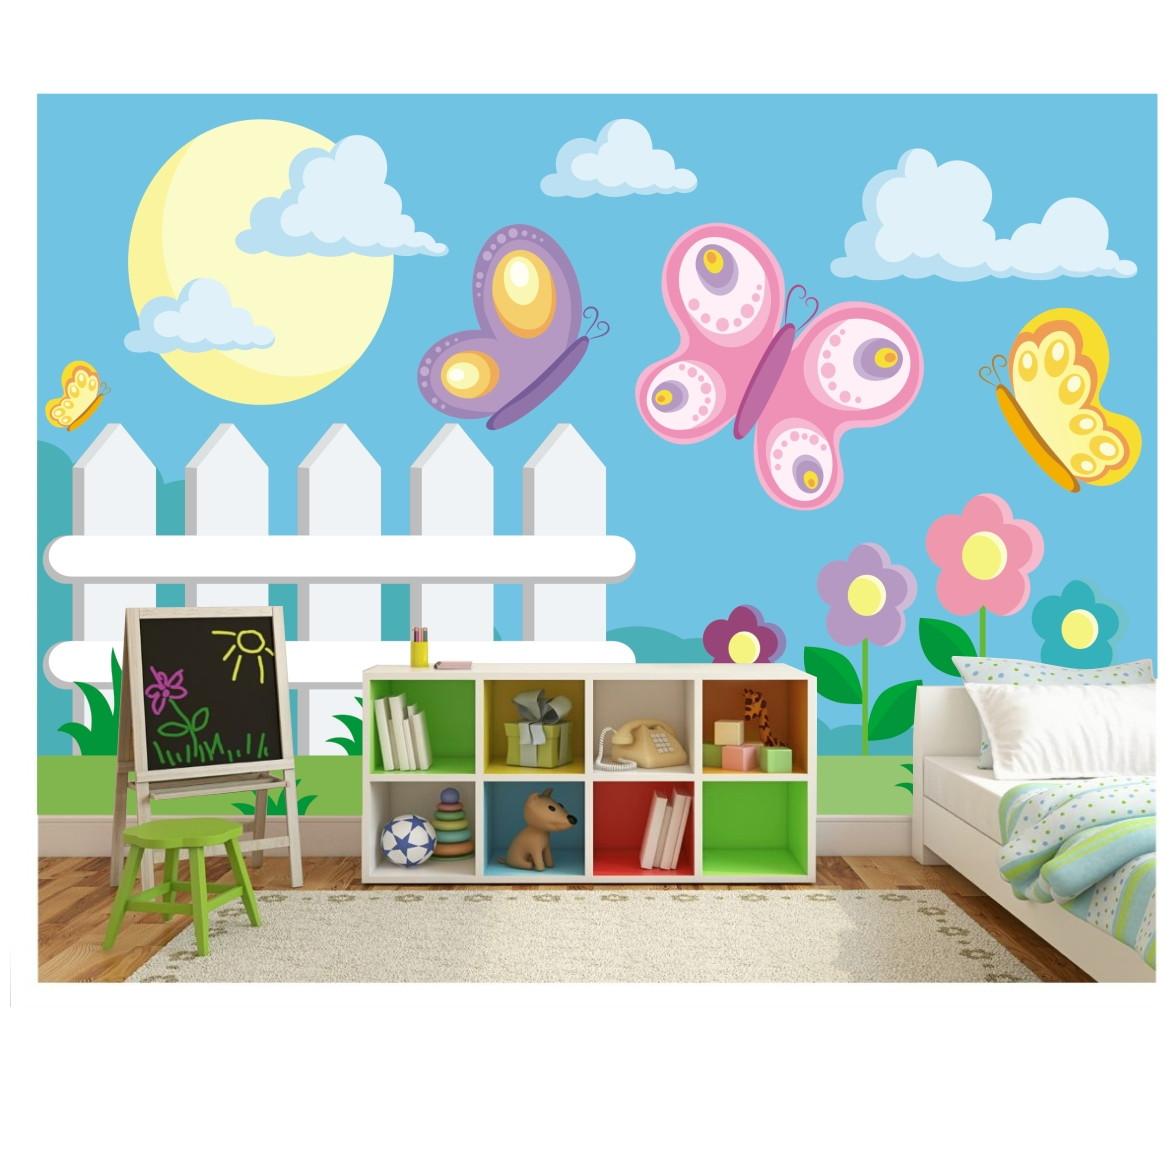 Adesivo infantil mural borboletas 6m 17 no elo7 - Mural pared infantil ...